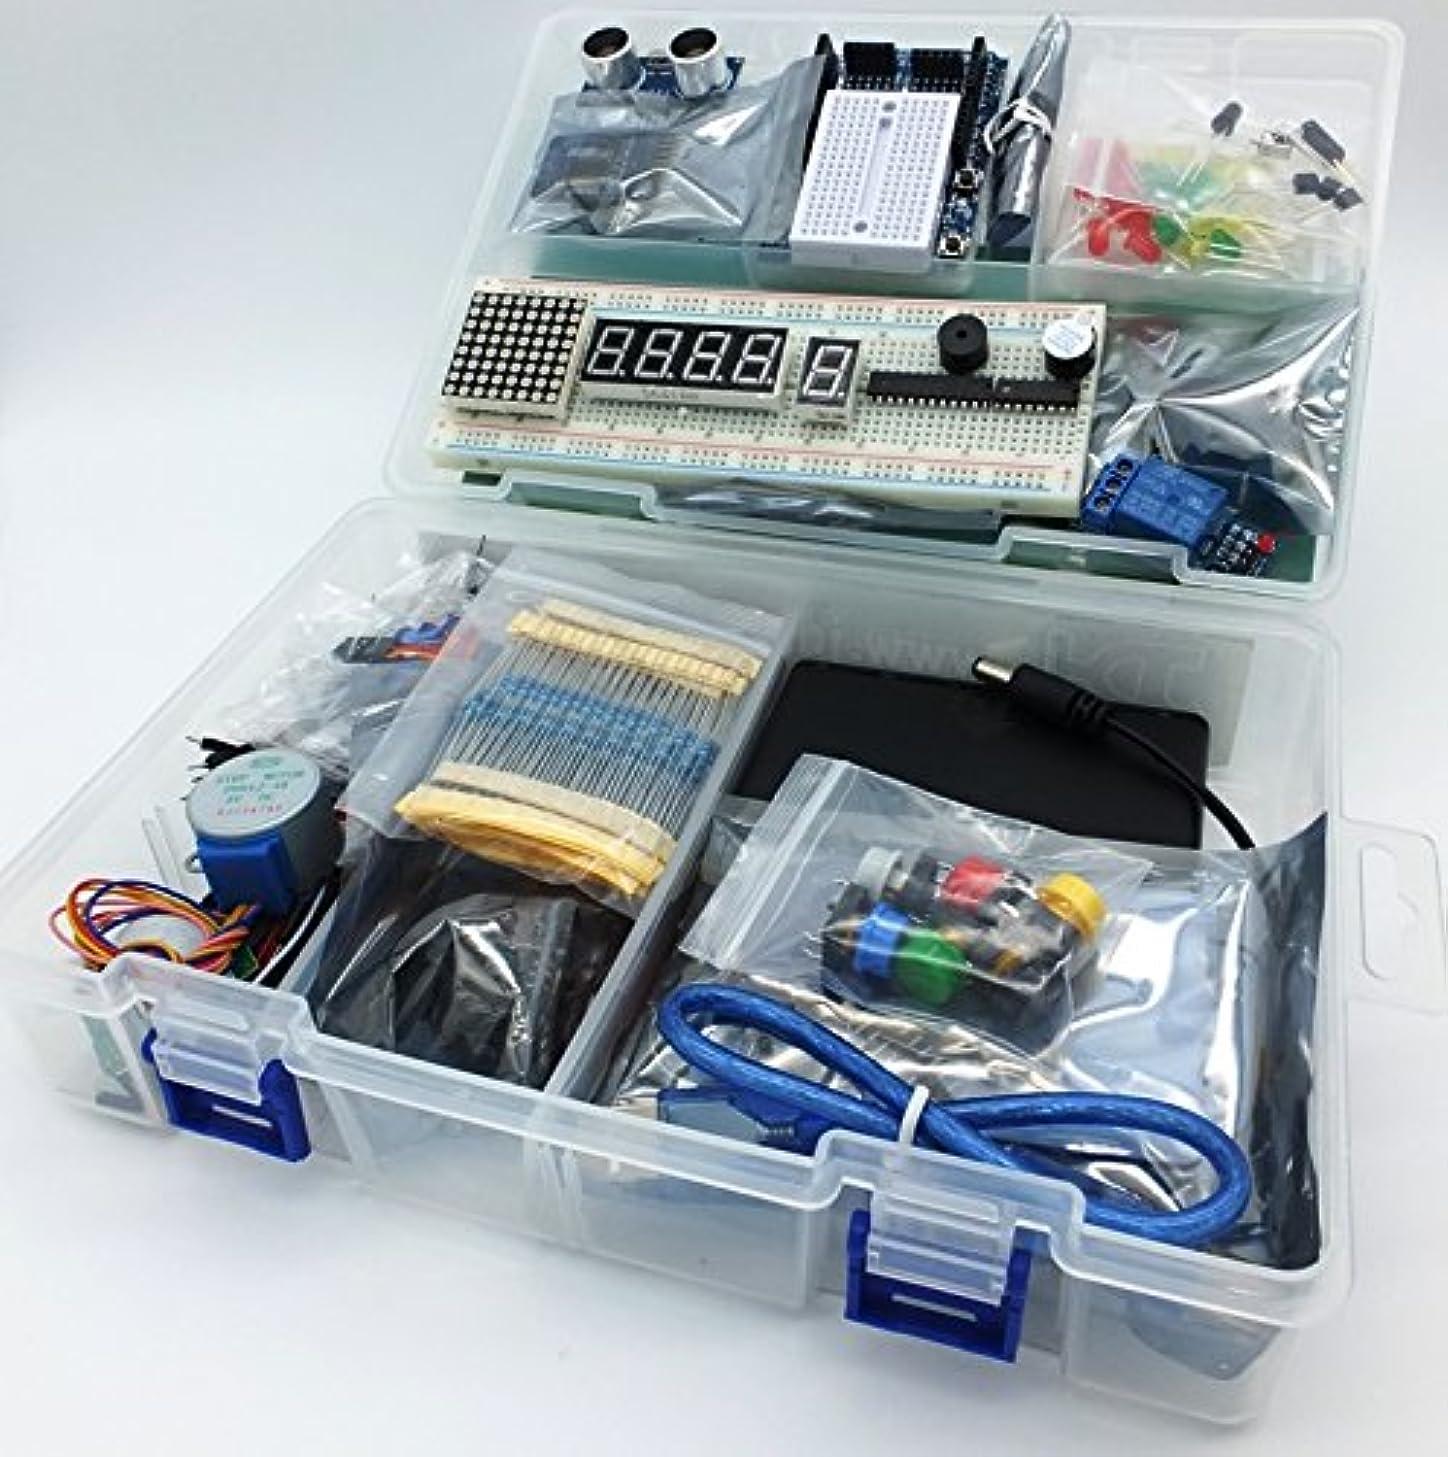 MEGA Starter kit Ultra (100% Arduino IDE compatible) w/ batt holder, WiFi, Bluetooth, Sensors, Modules, Resistor pack and Components